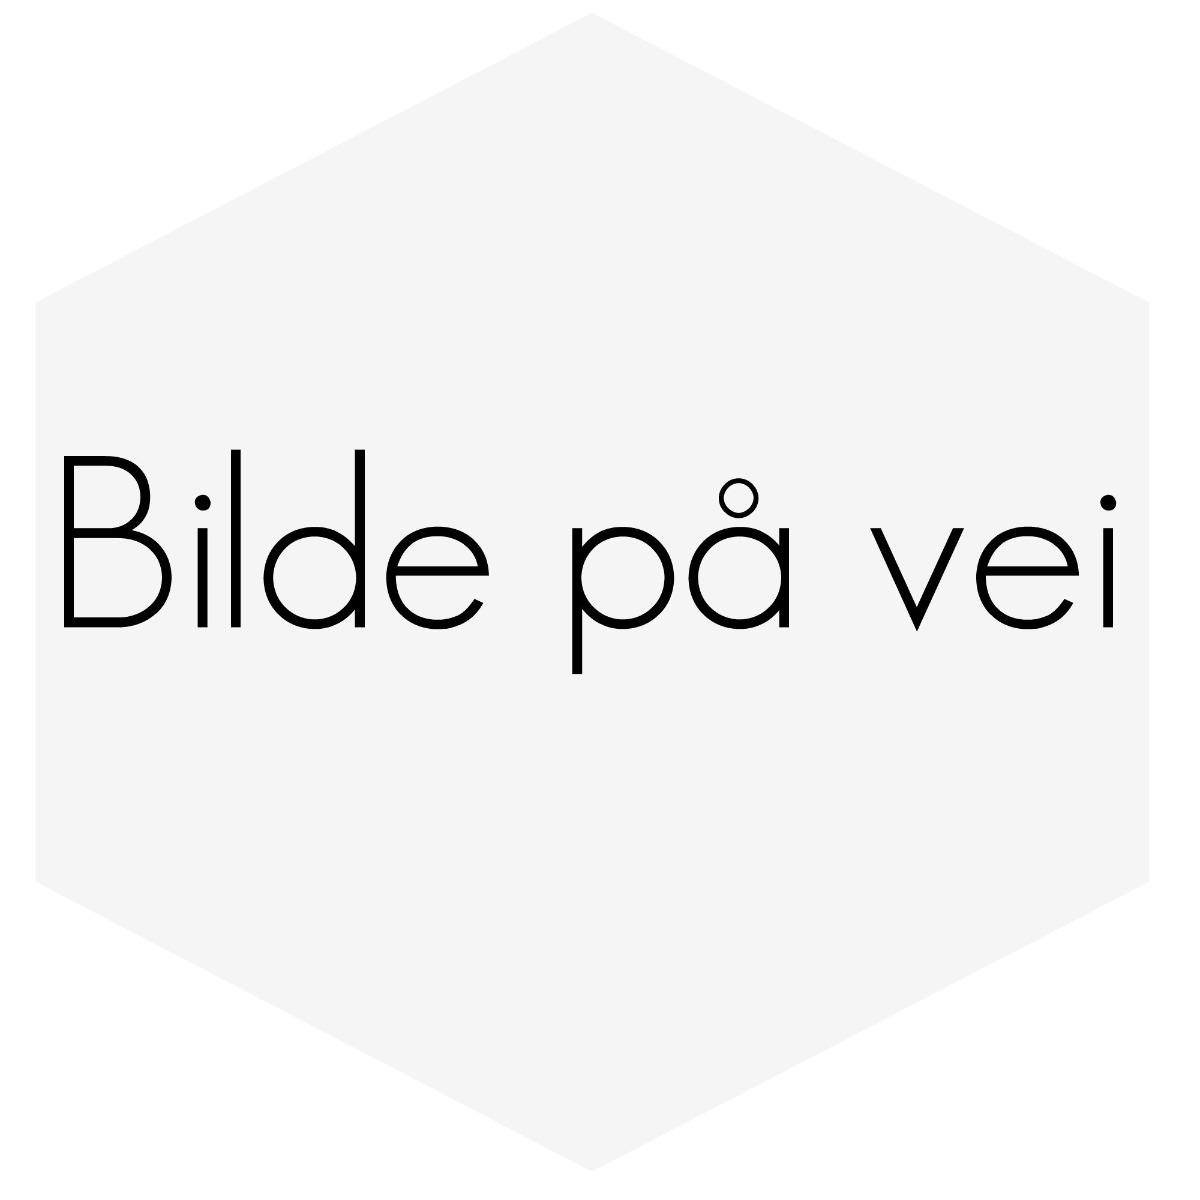 HÅNDBREKK HYDRAULISK UNIVERSAL SORT ( SE BILDE)